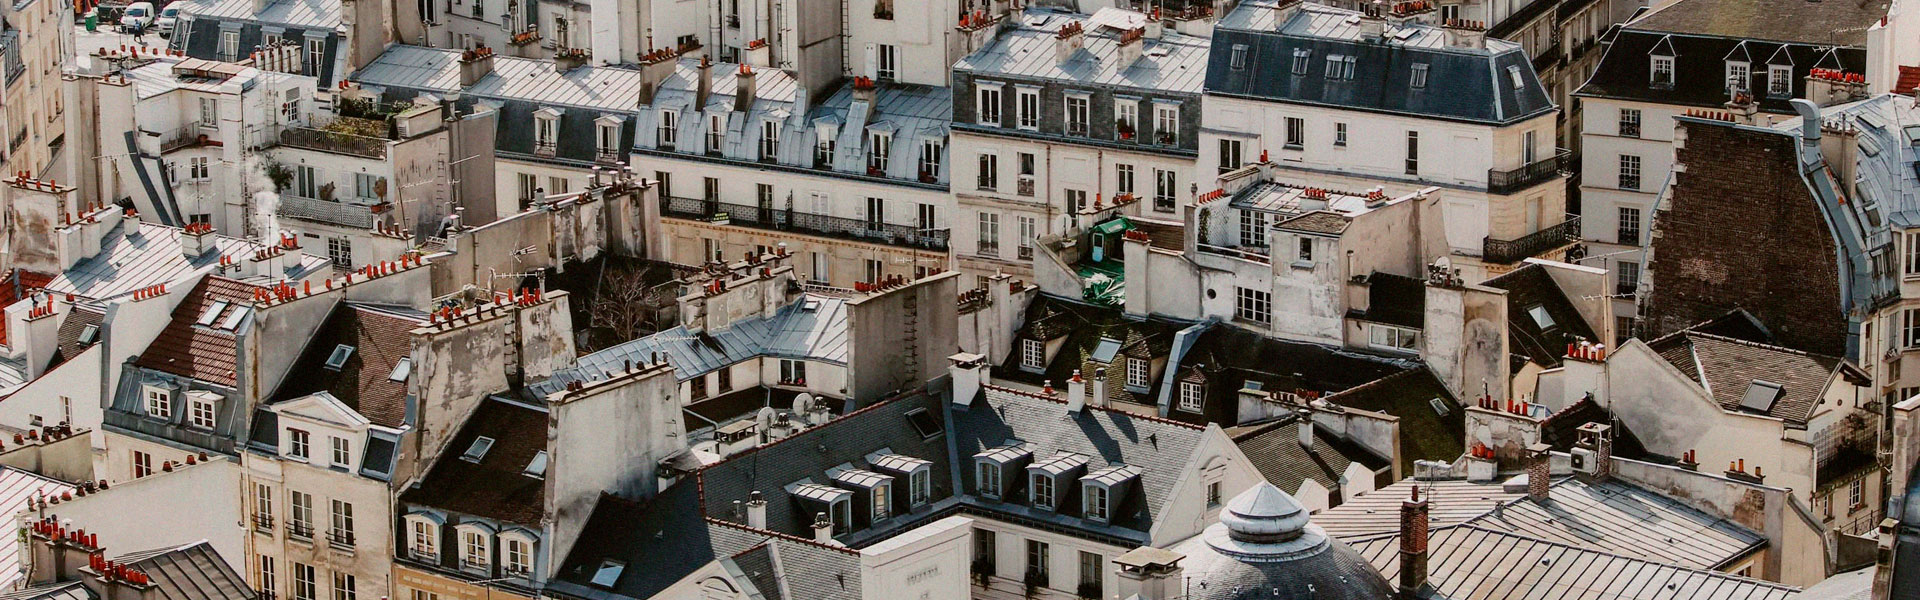 bairros-de-paris